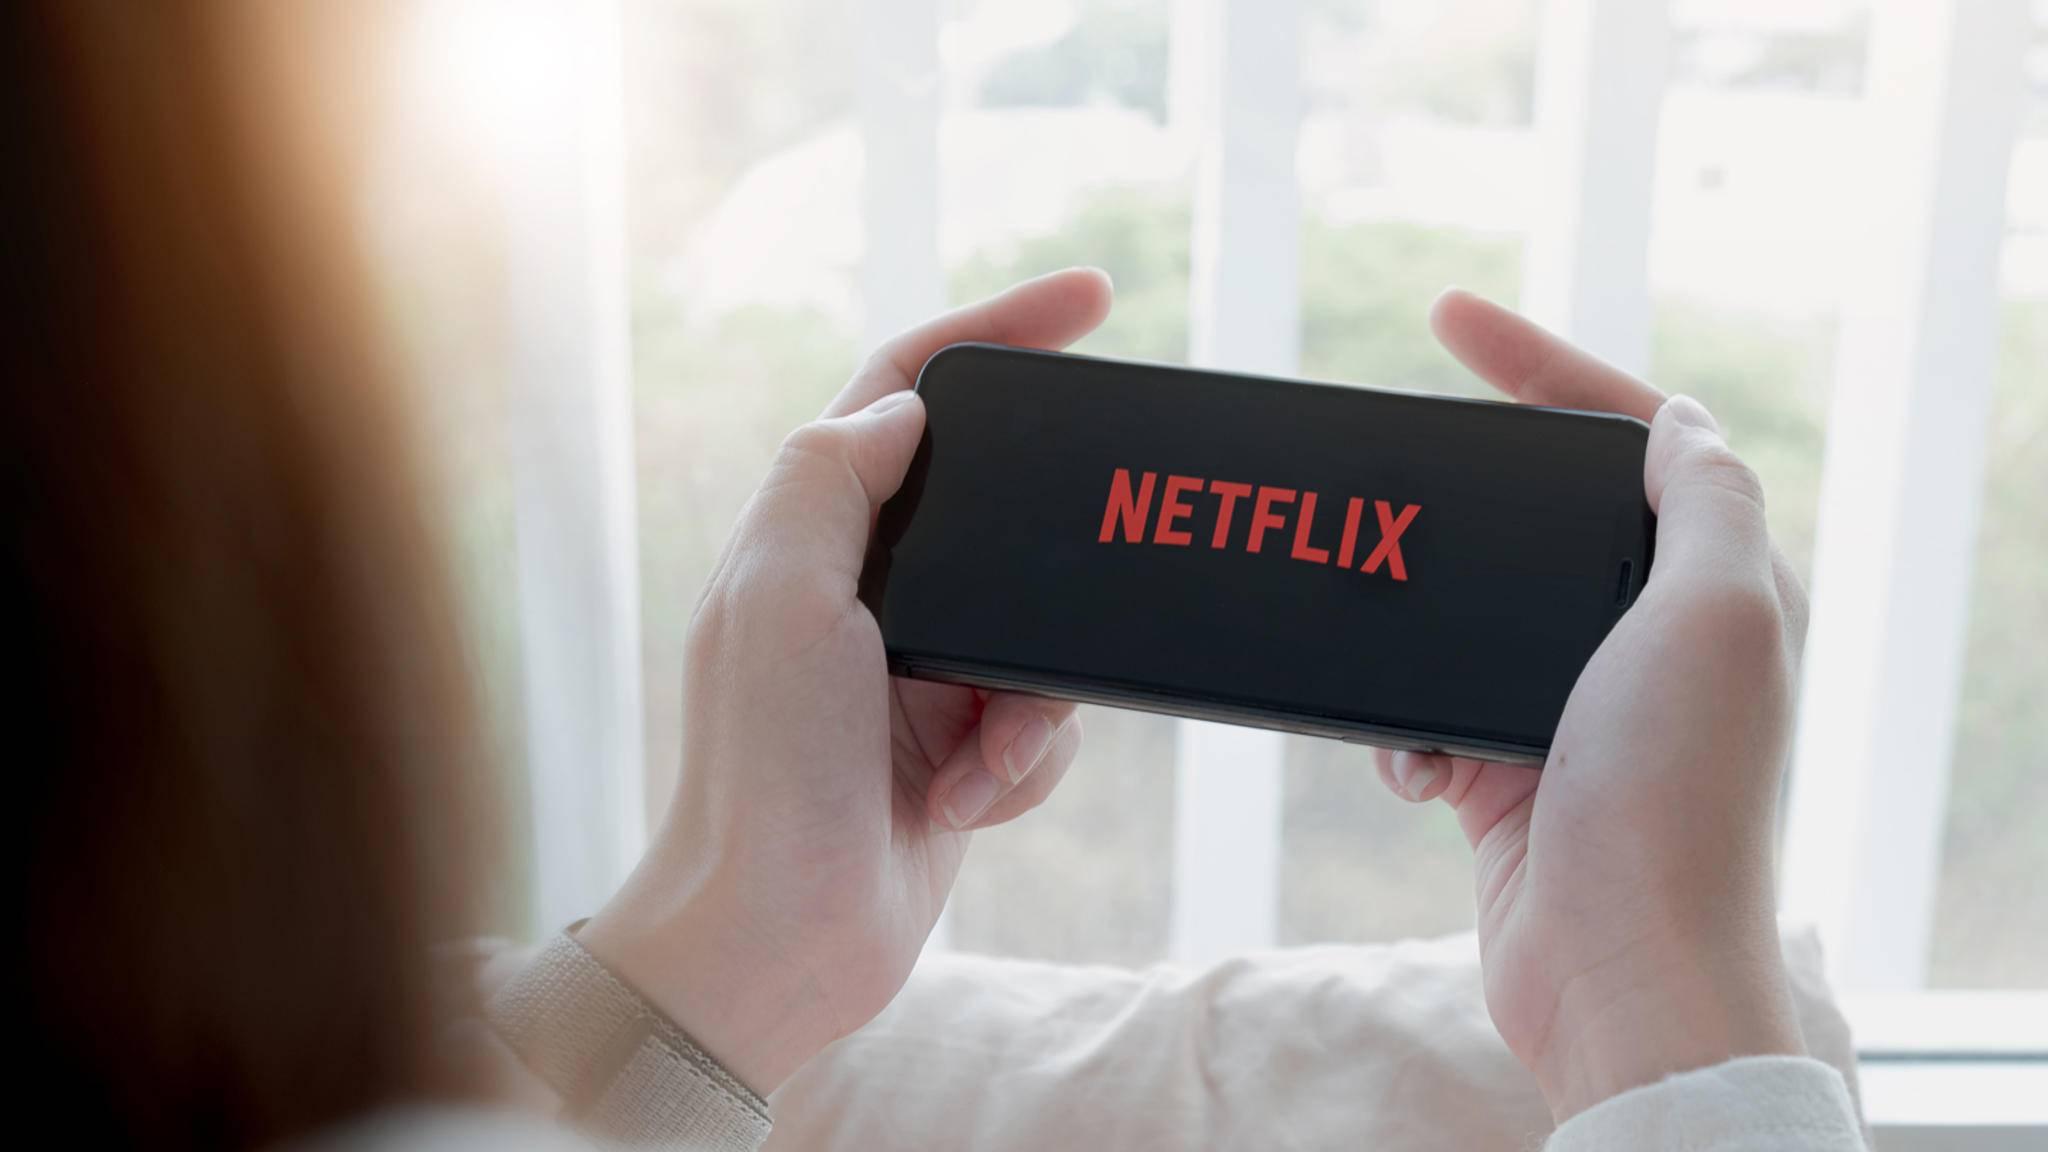 Netflix Smartphone